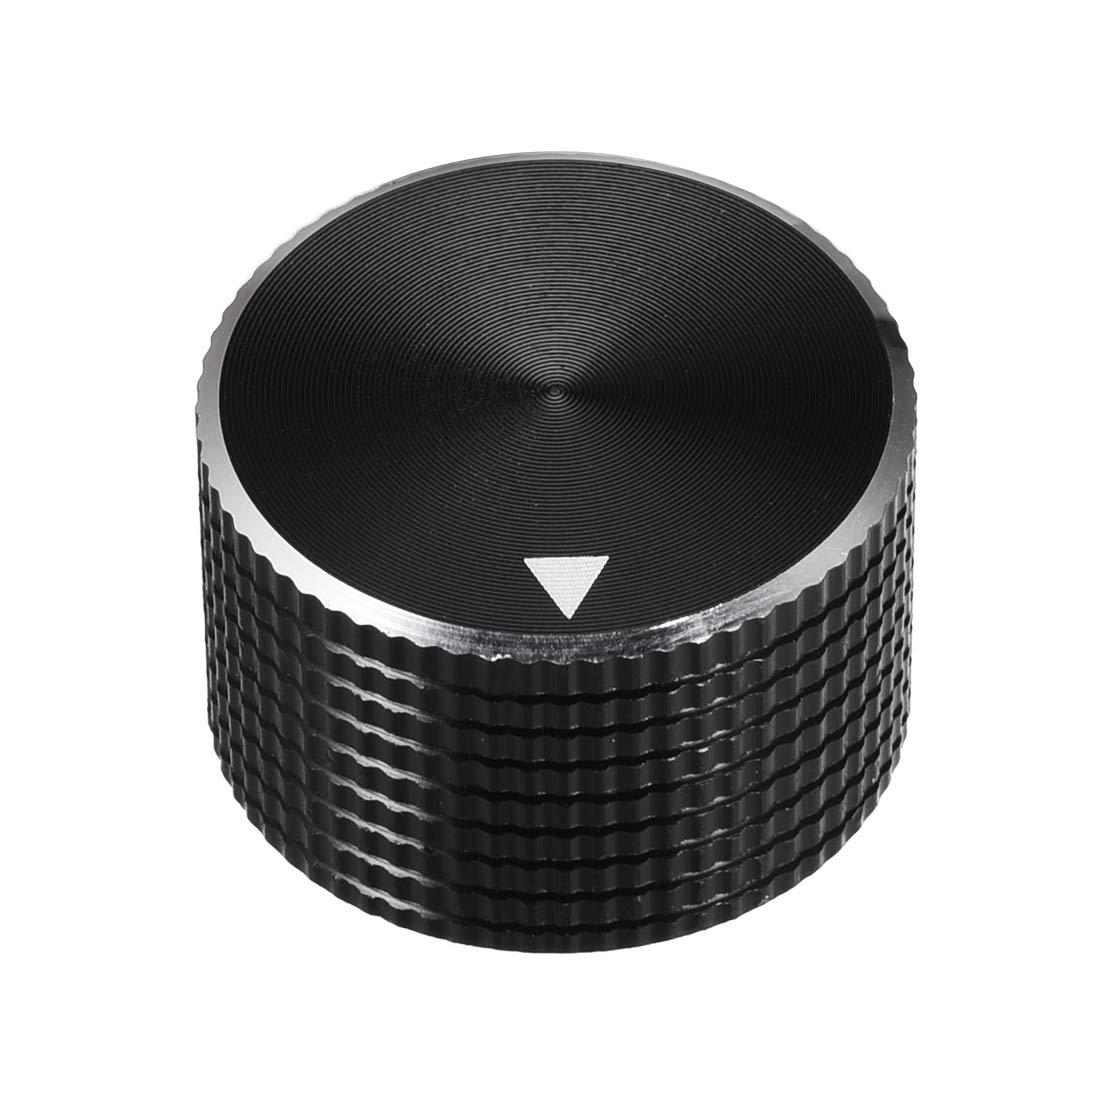 25 * 6 * 15.5 mm Aluminium Alloy Volume Control Knobs Black 2pcs uxcell/® Stereo Knob